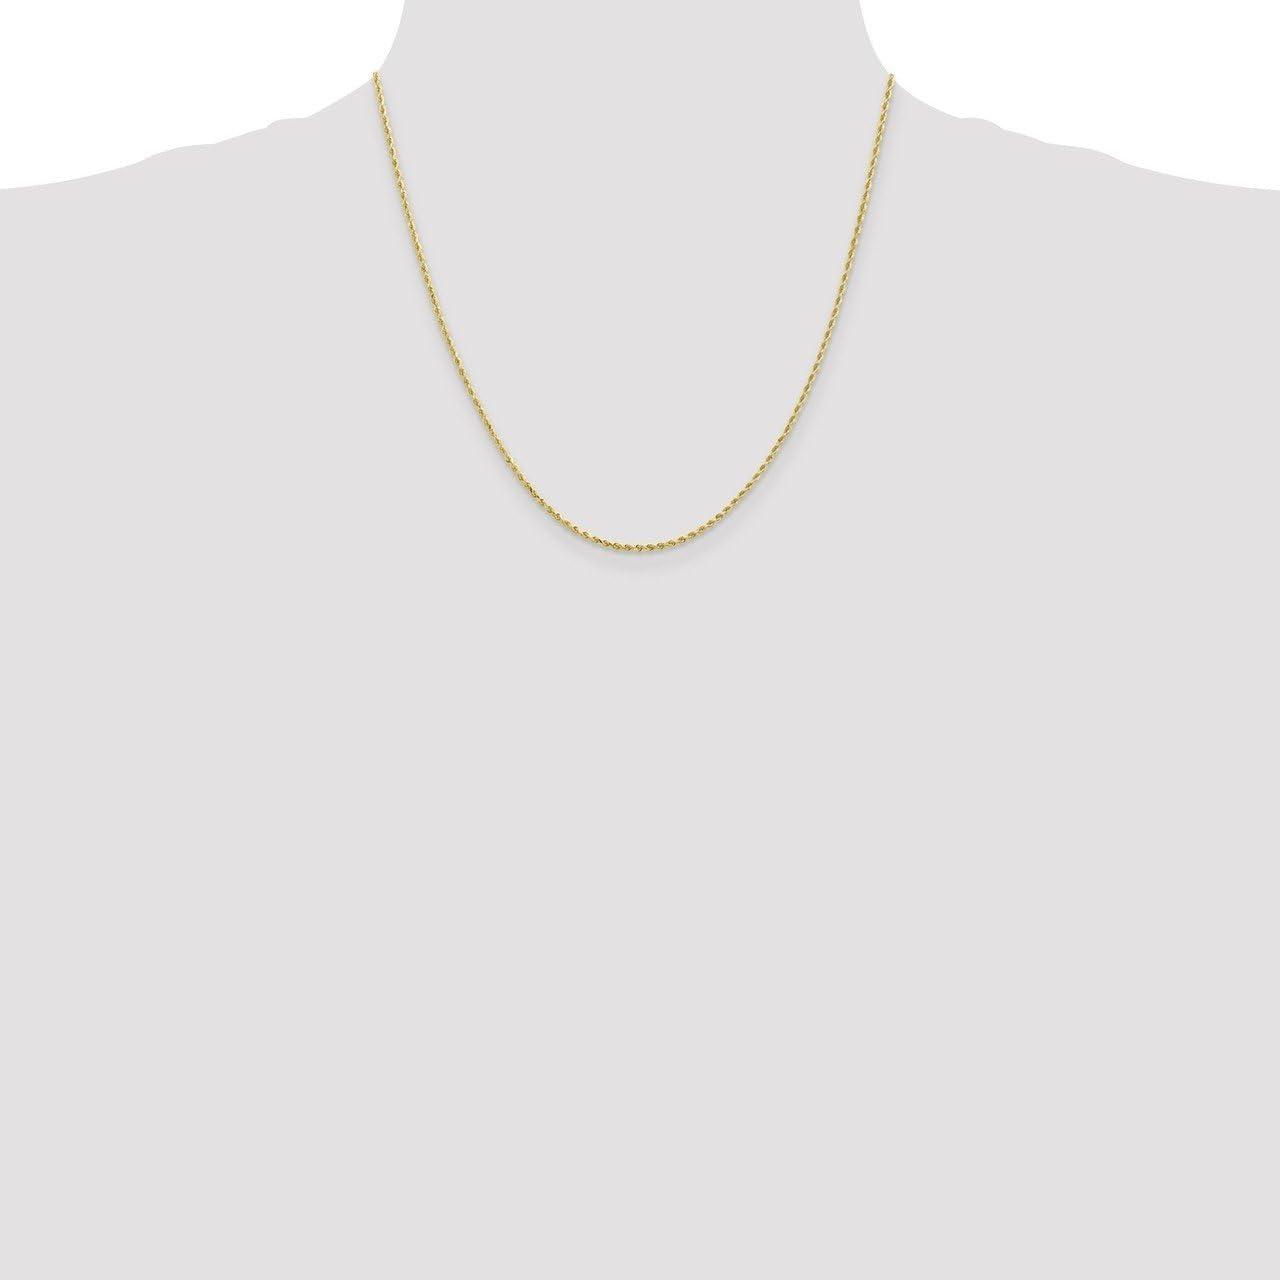 Lex /& Lu Leslies 10k Yellow Gold 1.75mm D//C Rope Chain Necklace or Bracelet